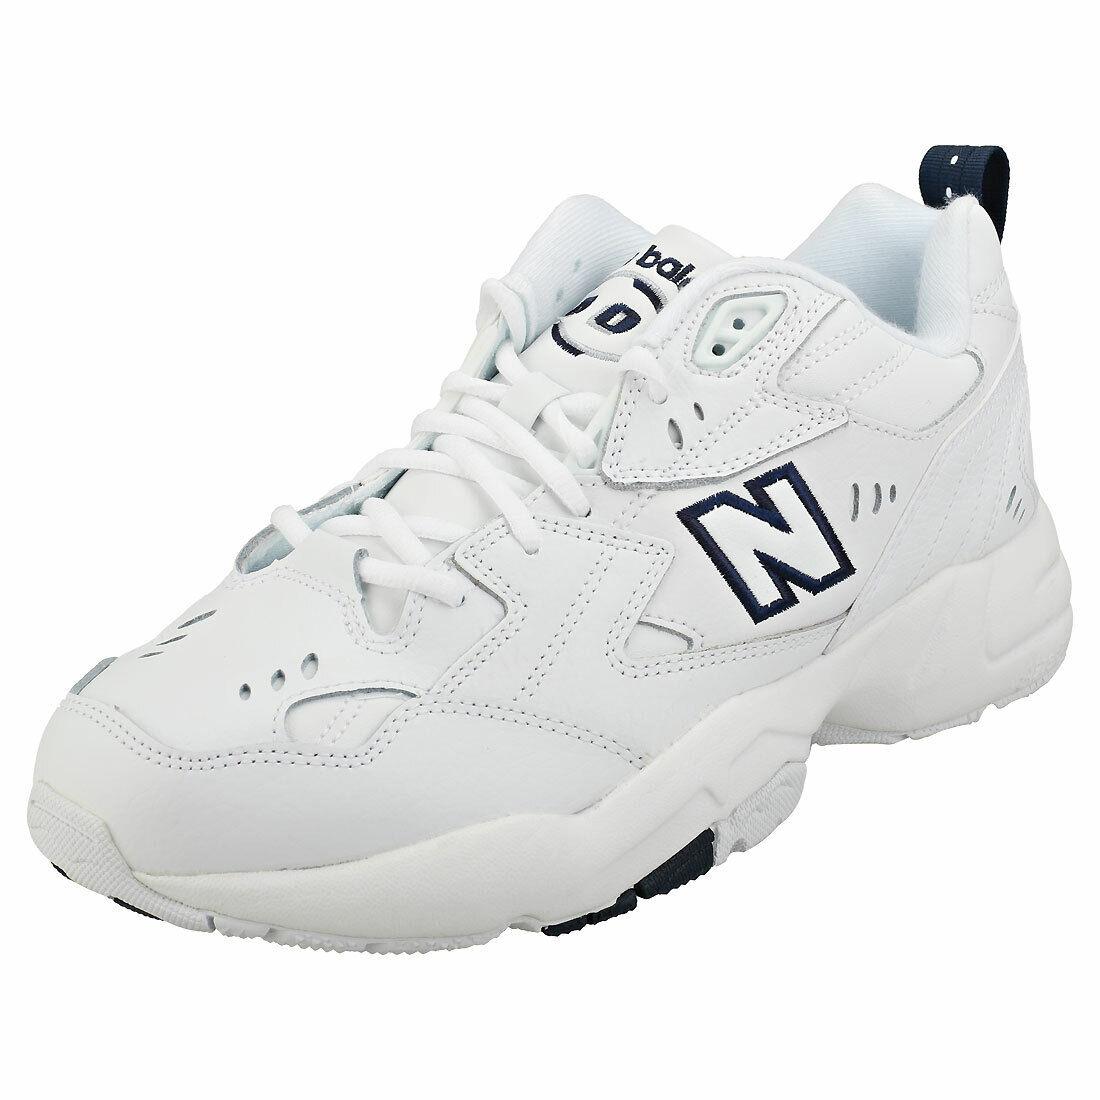 perdita controllore creativo  New Balance 608v1 Mens White Navy Casual Trainers - 10 UK for sale